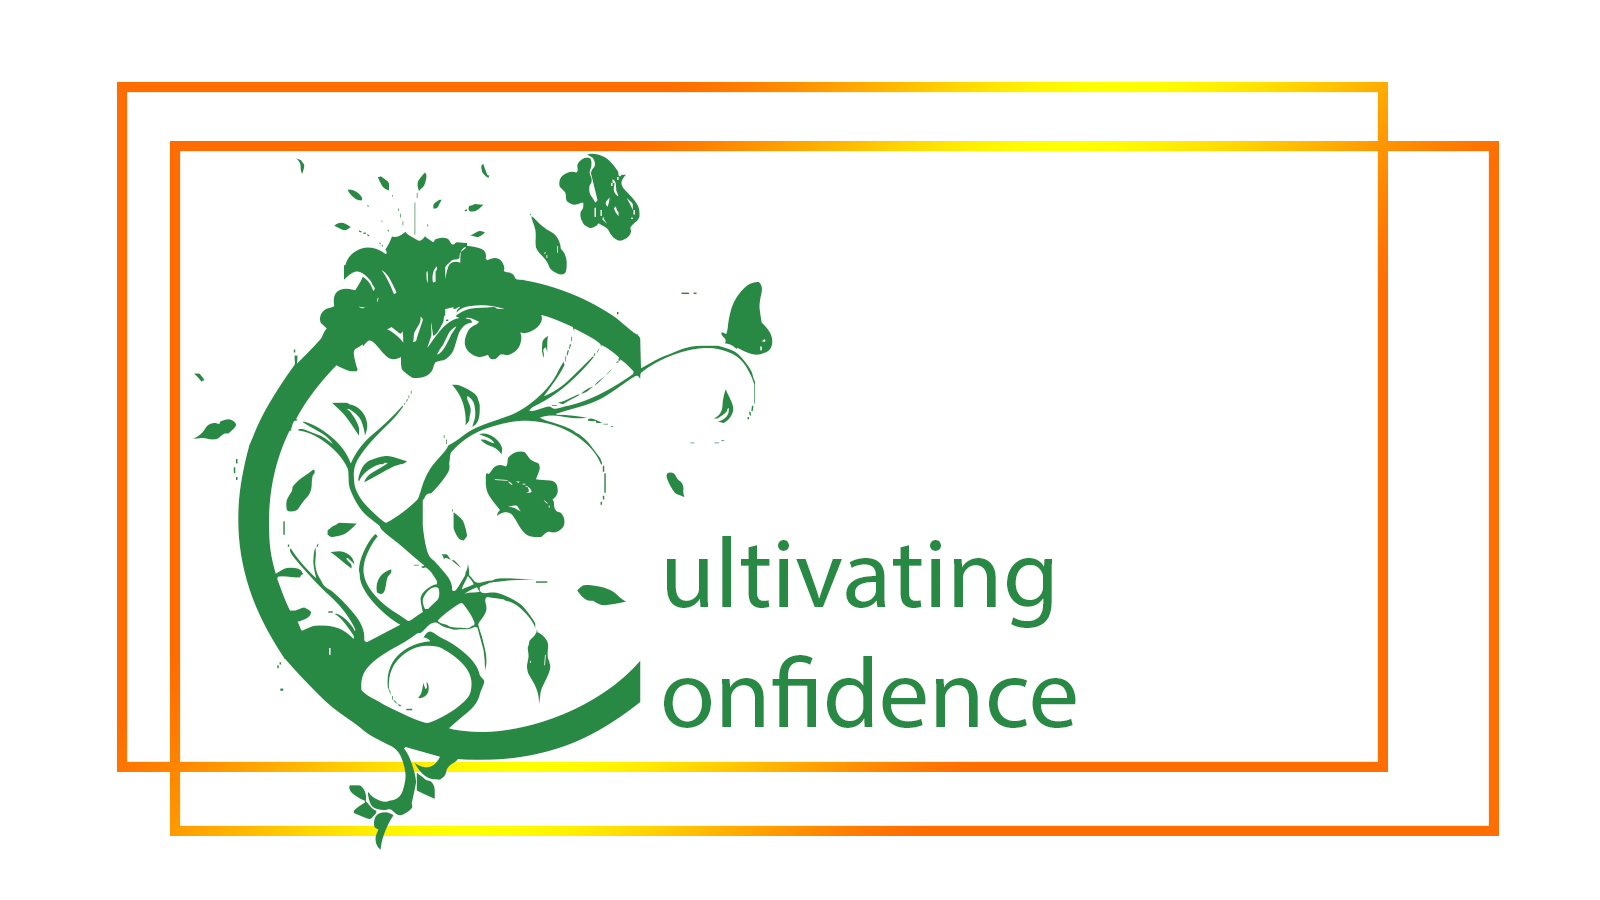 Cultivating Confidence (jim).jpg